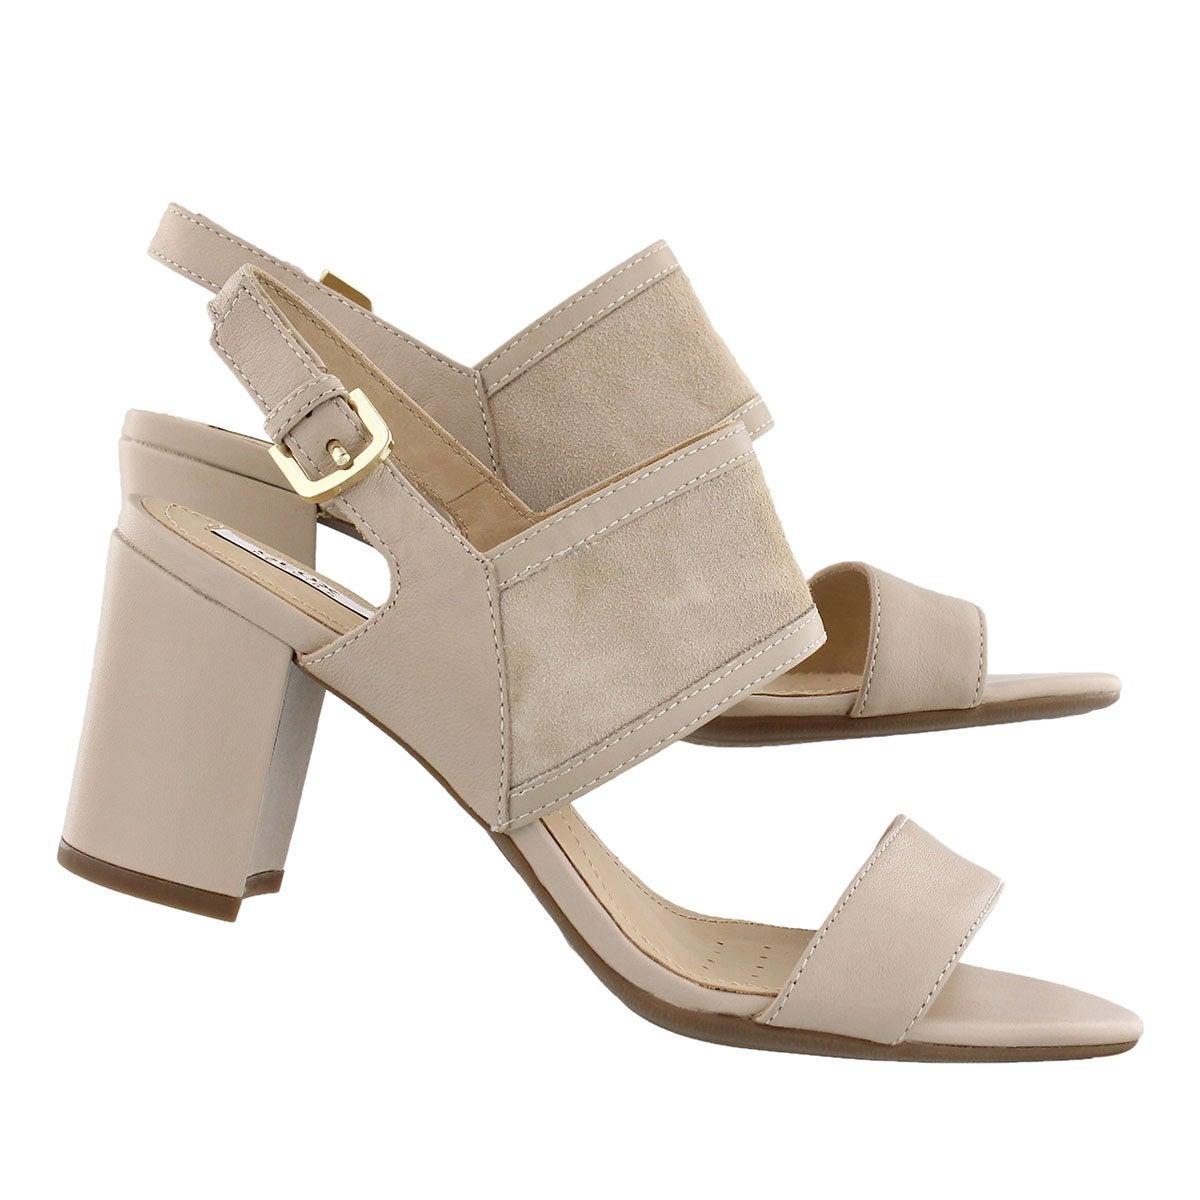 Lds Nesa B light taupe dress sandal